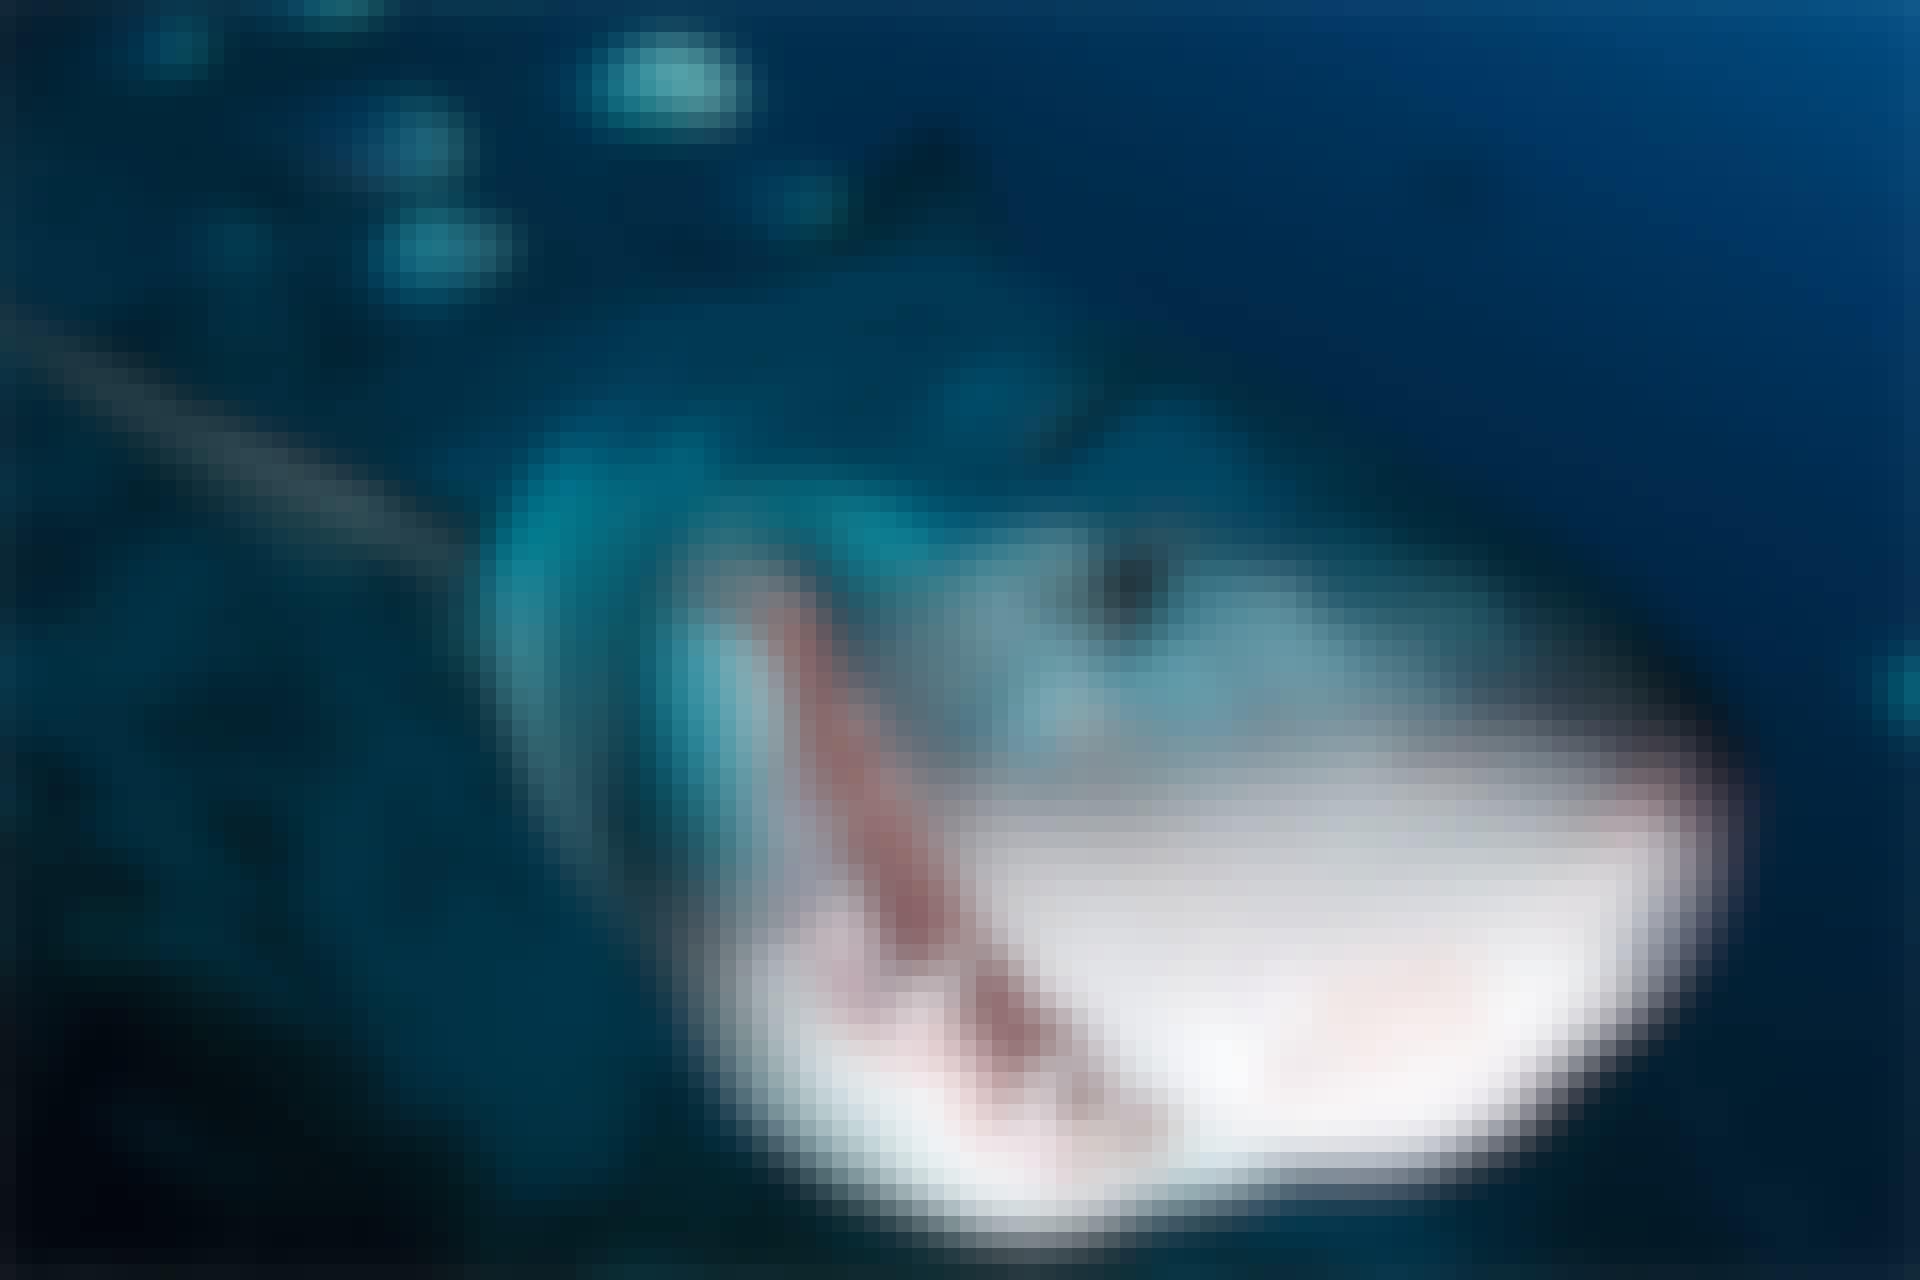 Jagende haj